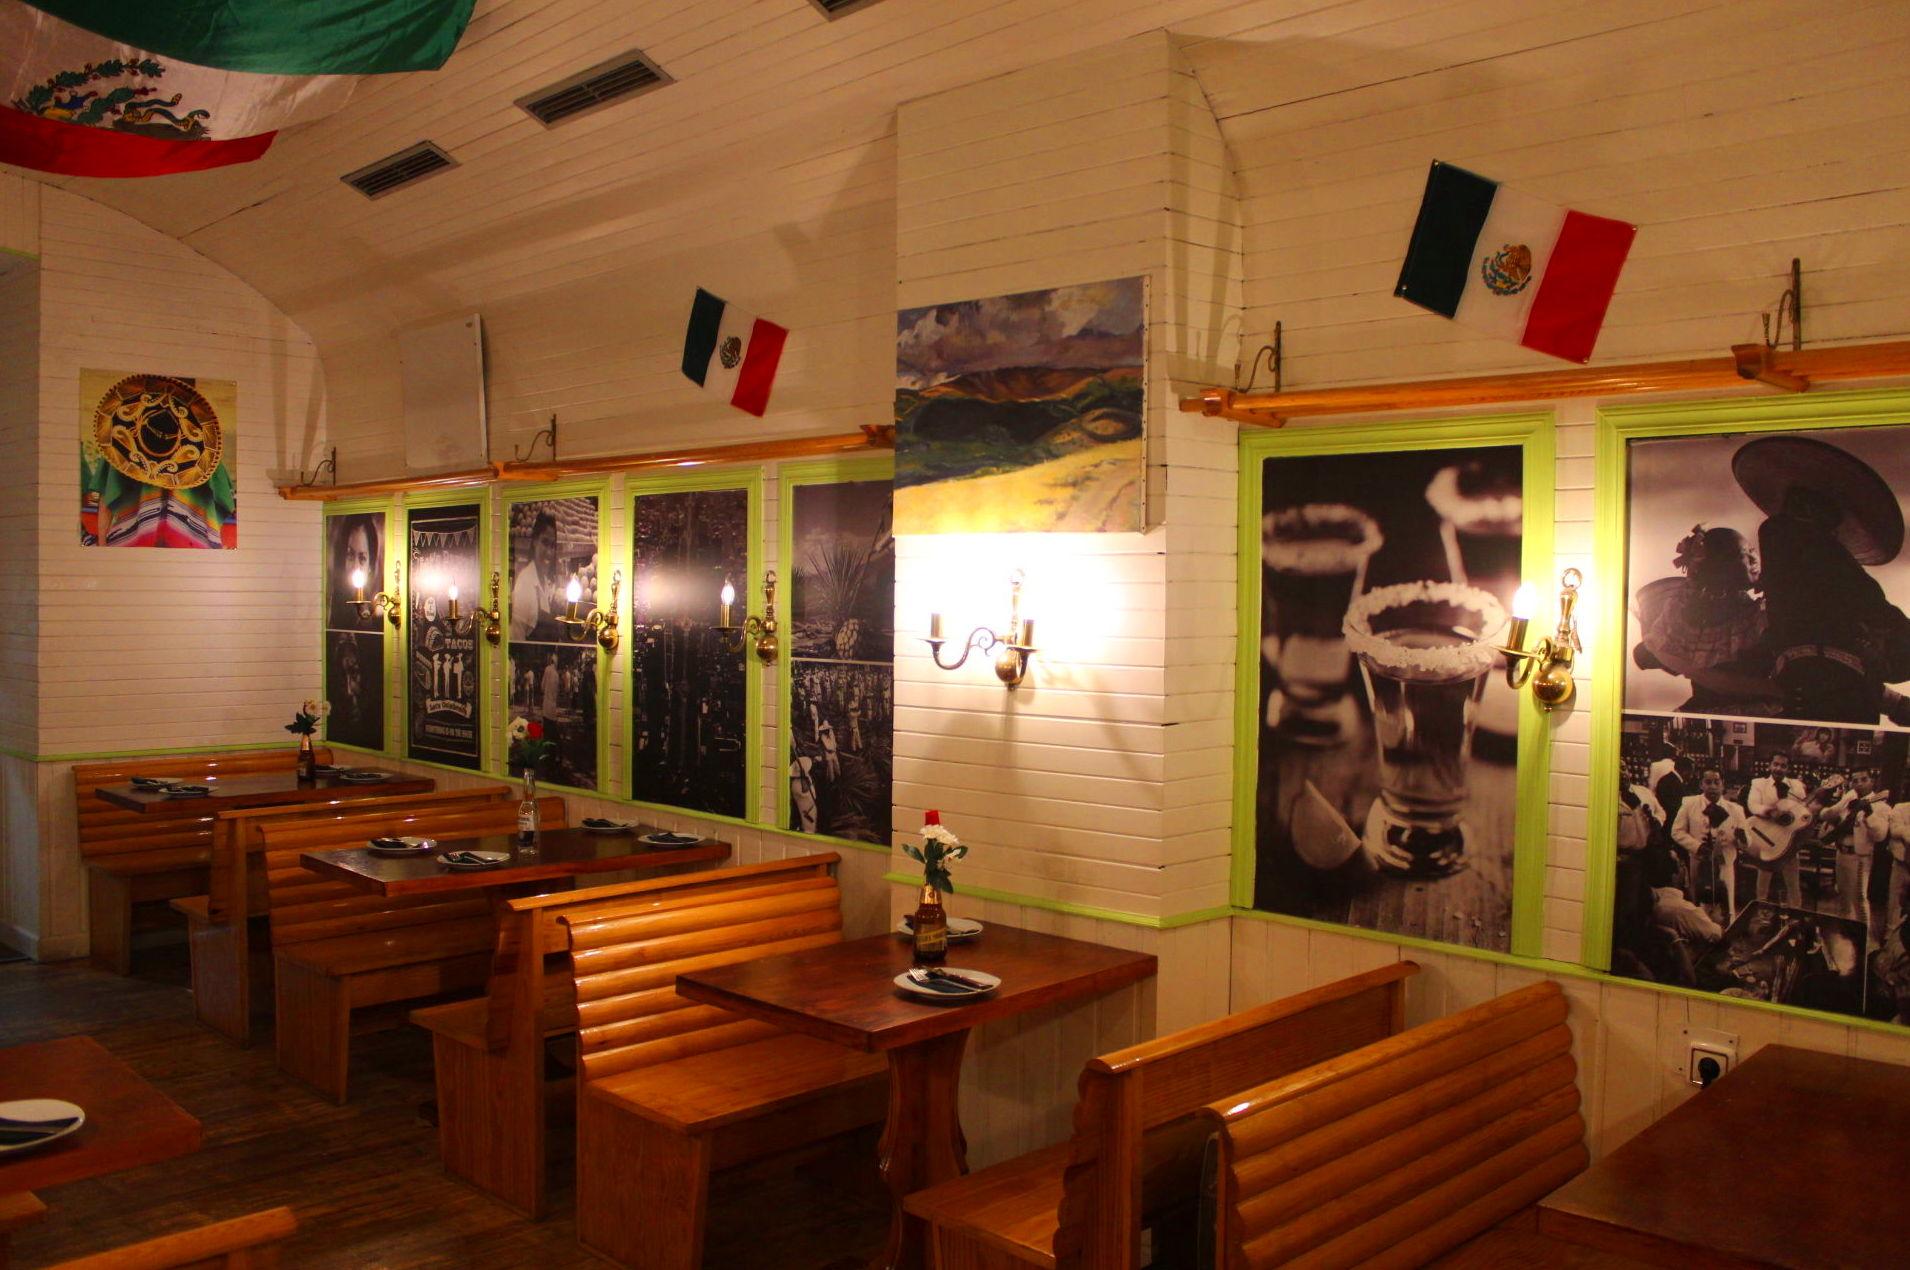 Foto 7 de Cocina mexicana en Madrid | Restaurante Mezcal